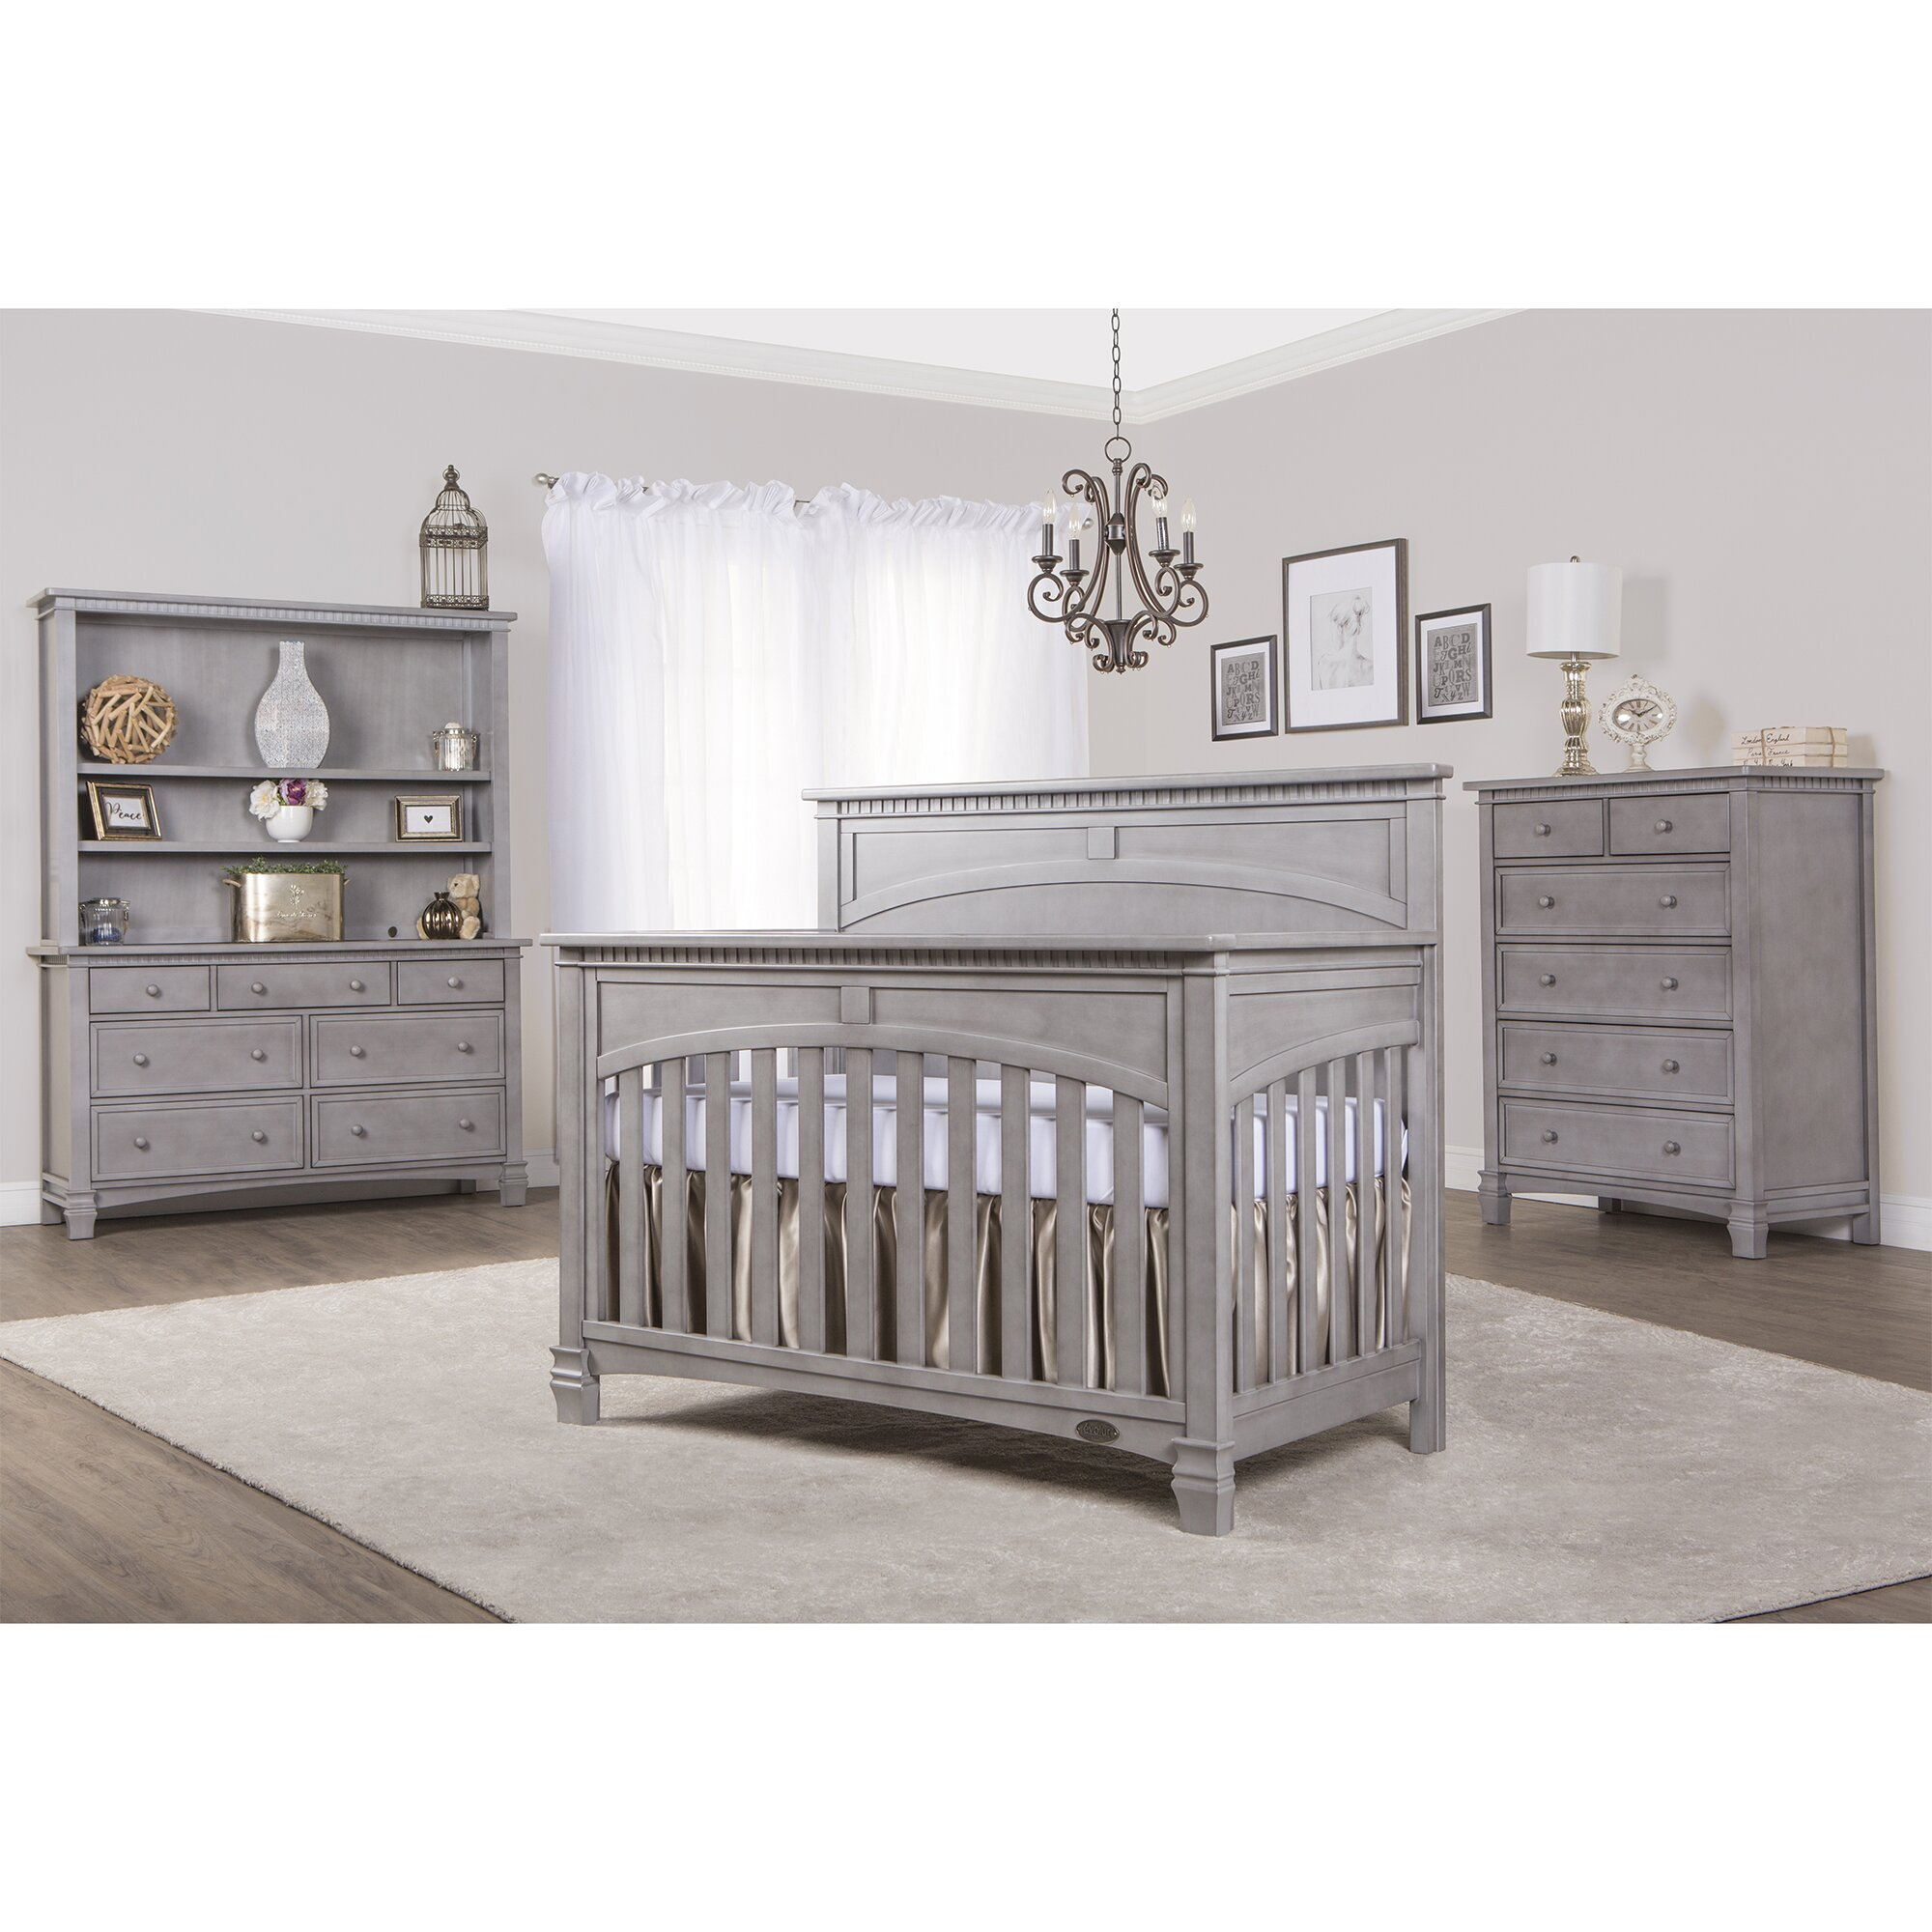 Baby cribs staten island - Evolur Santa Fe 5 In 1 Convertible Crib